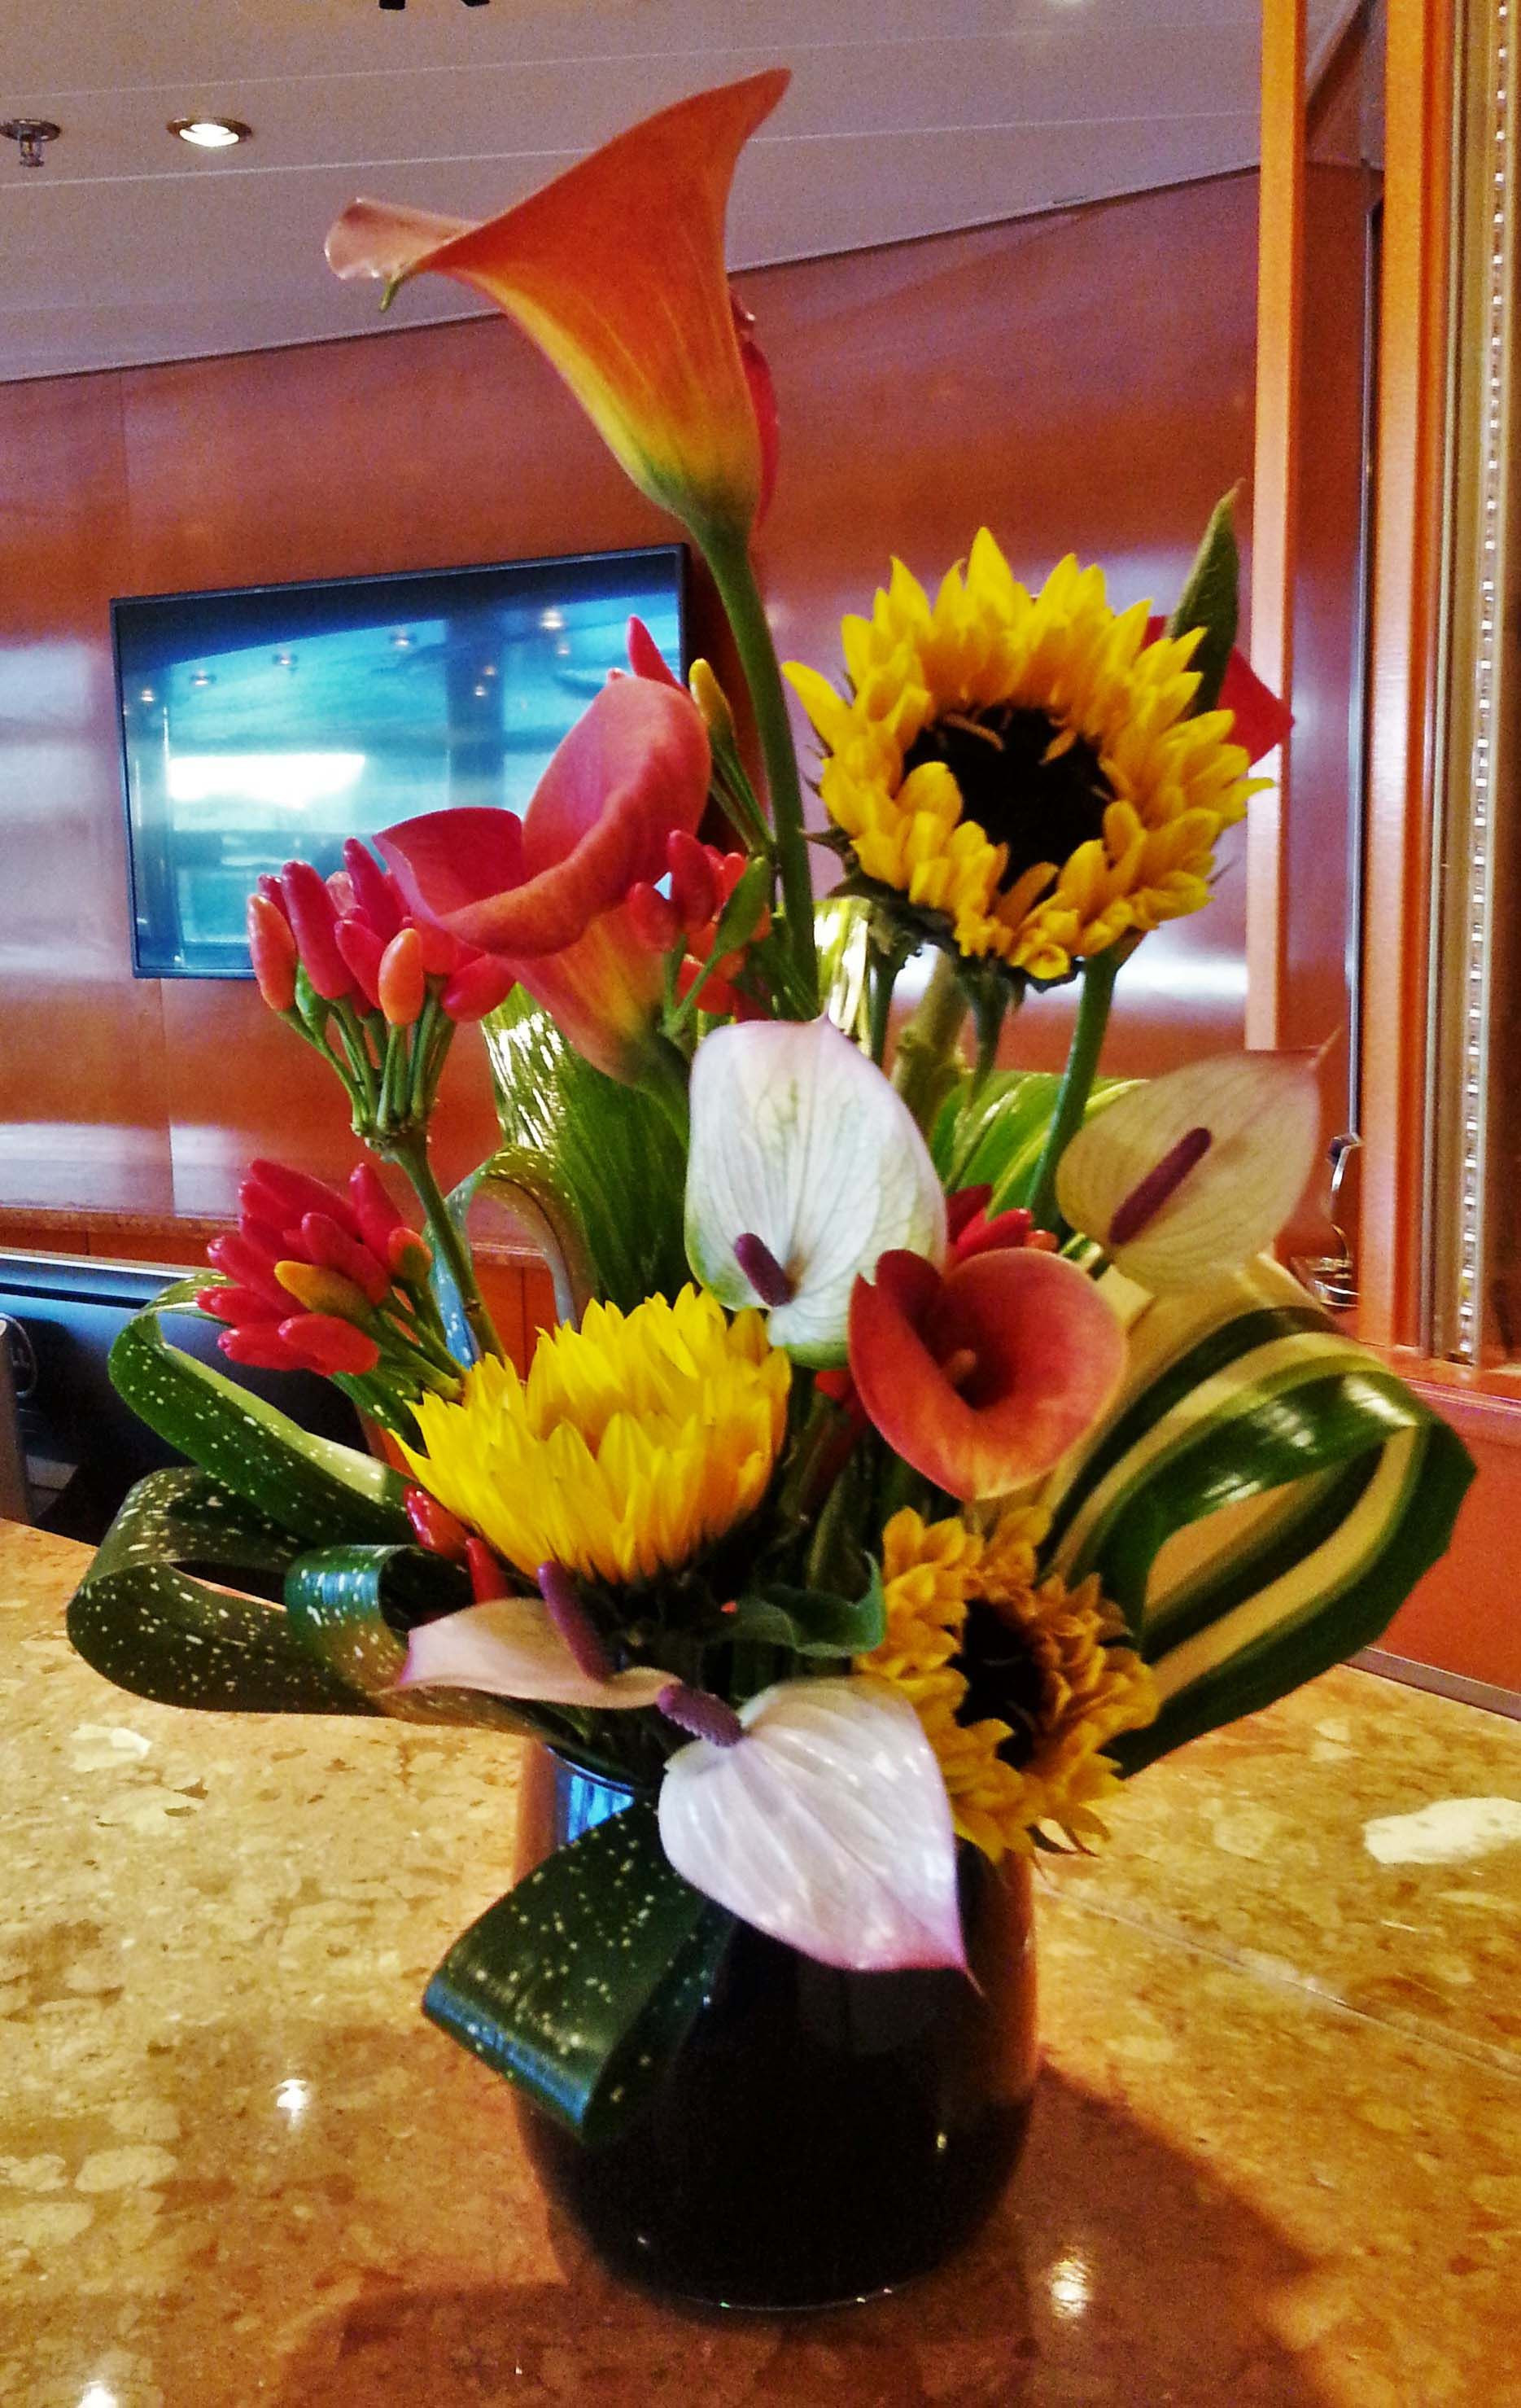 3 OD Sunflower Orange Calla Lily Pink Anthurium Chilli Peppers Foliage in black vase